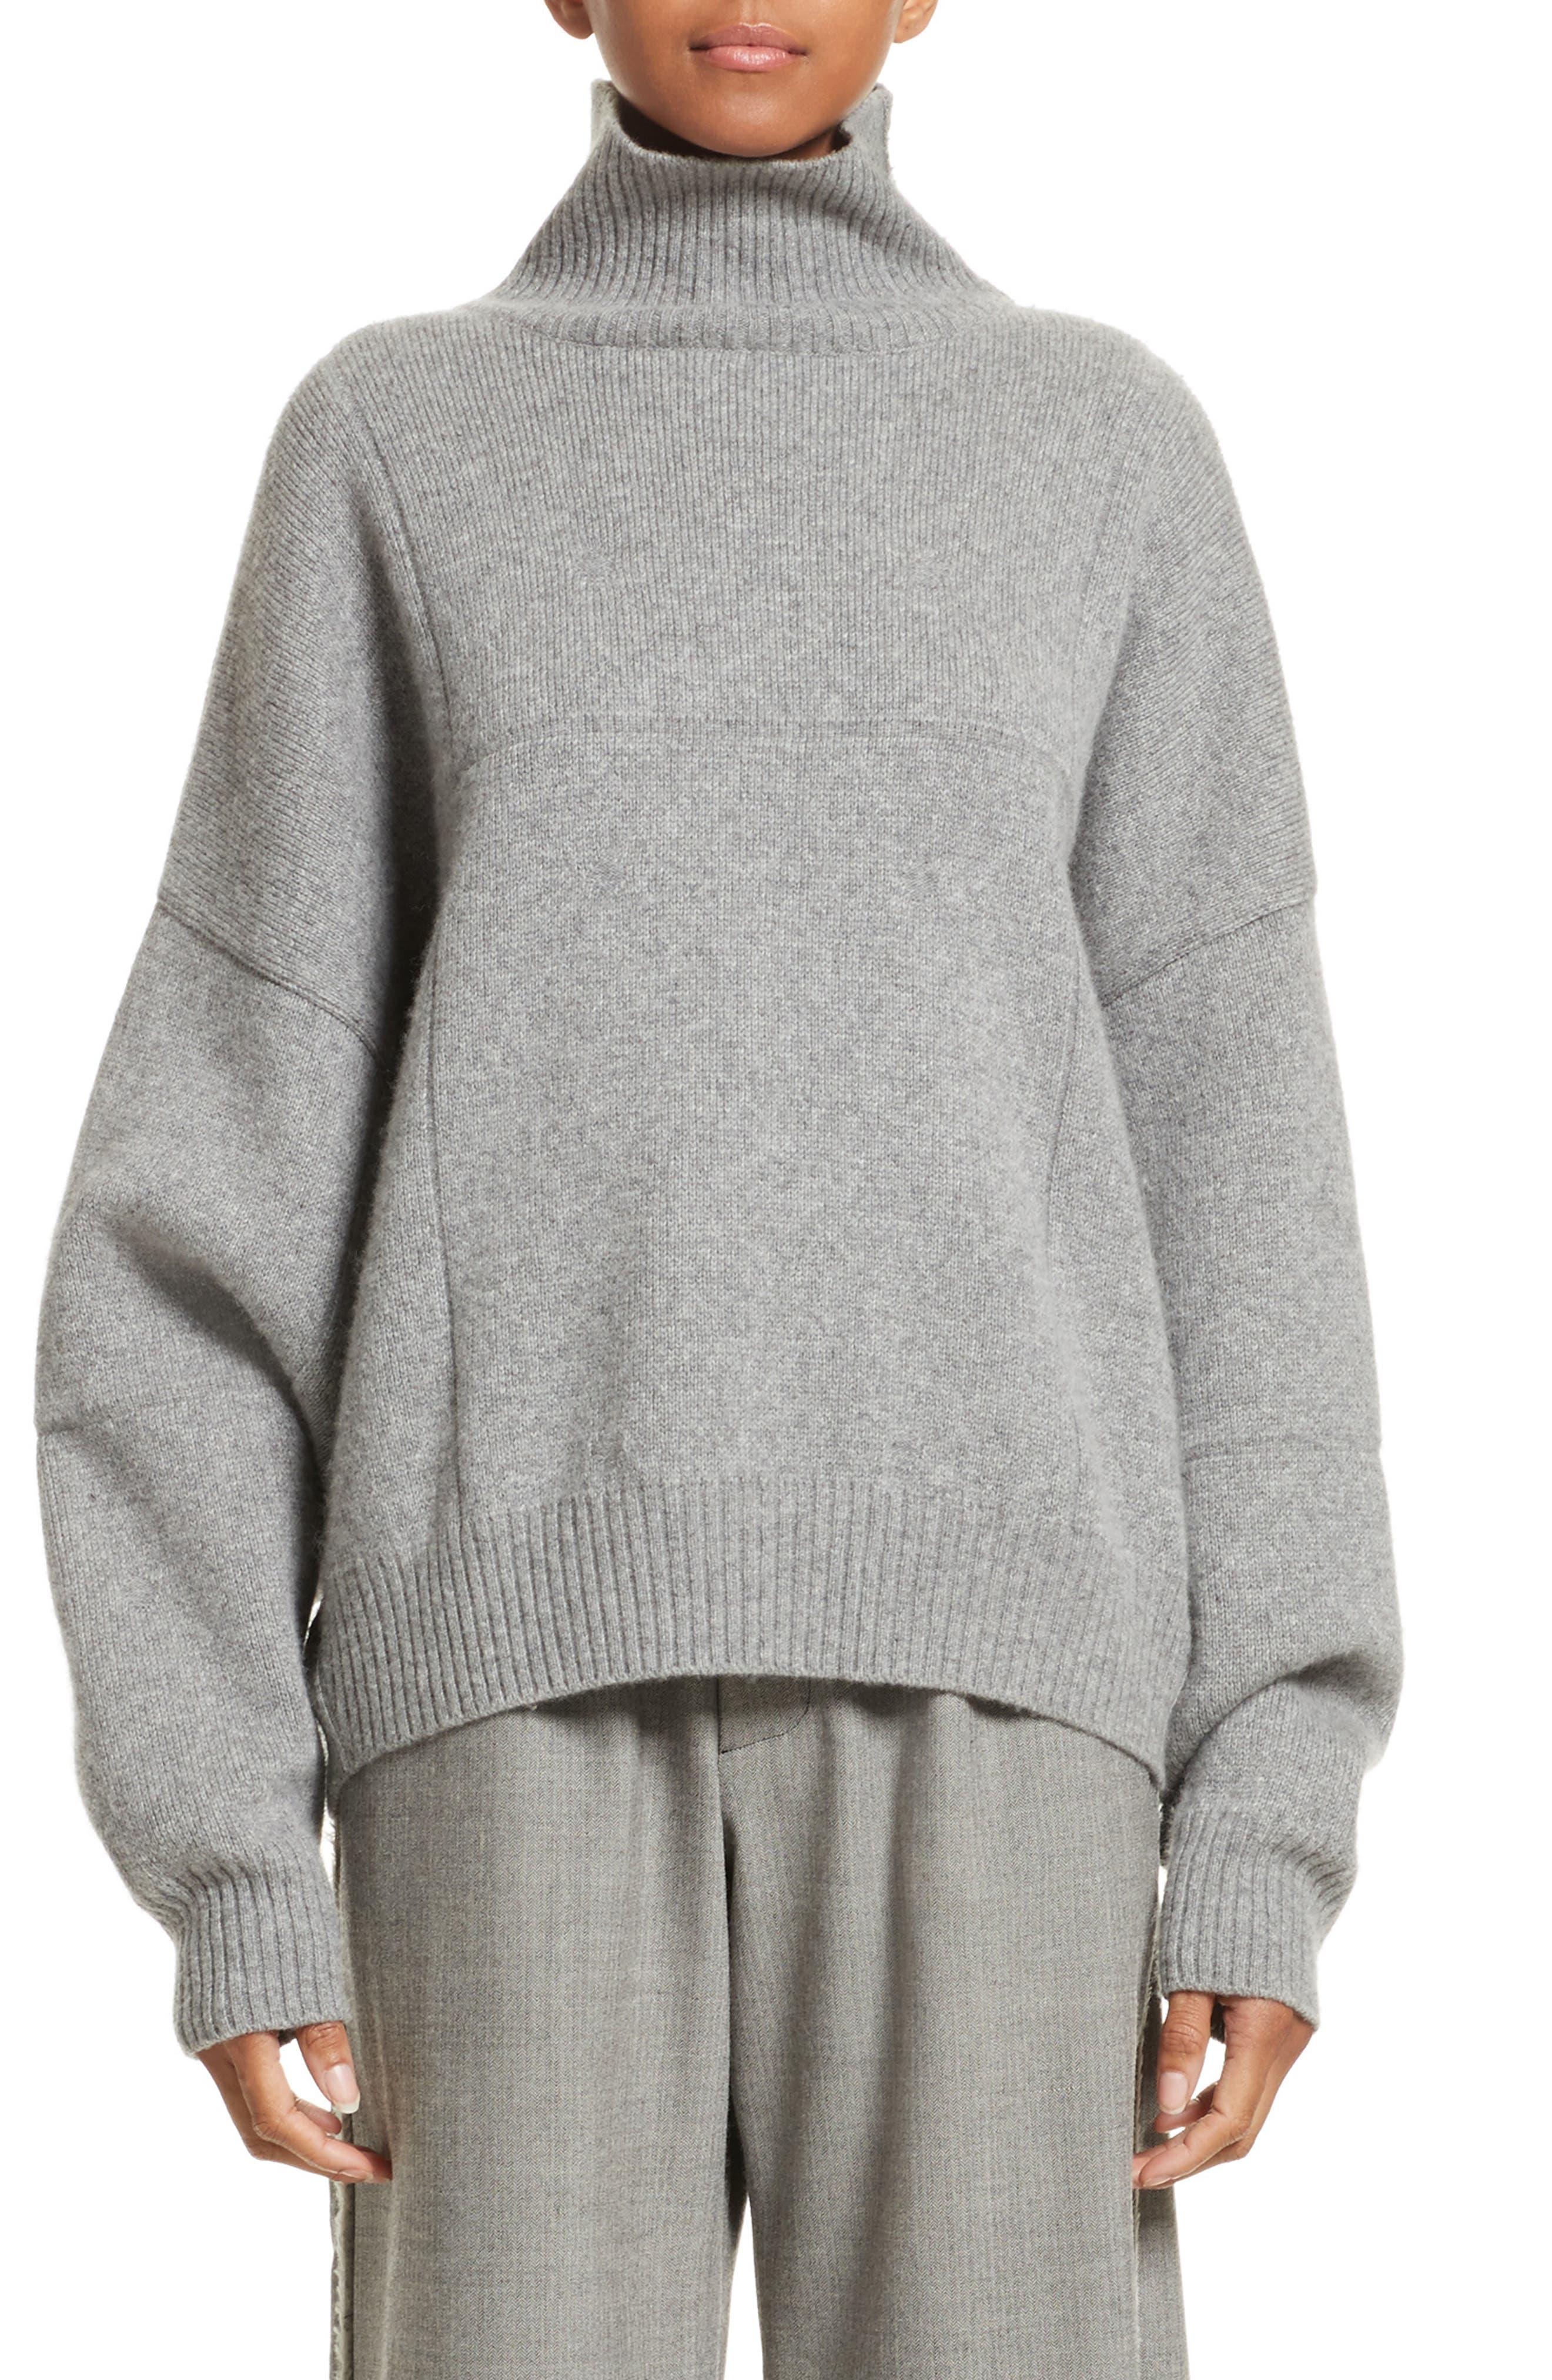 Concrete Wool Turtleneck Sweater,                         Main,                         color, 050